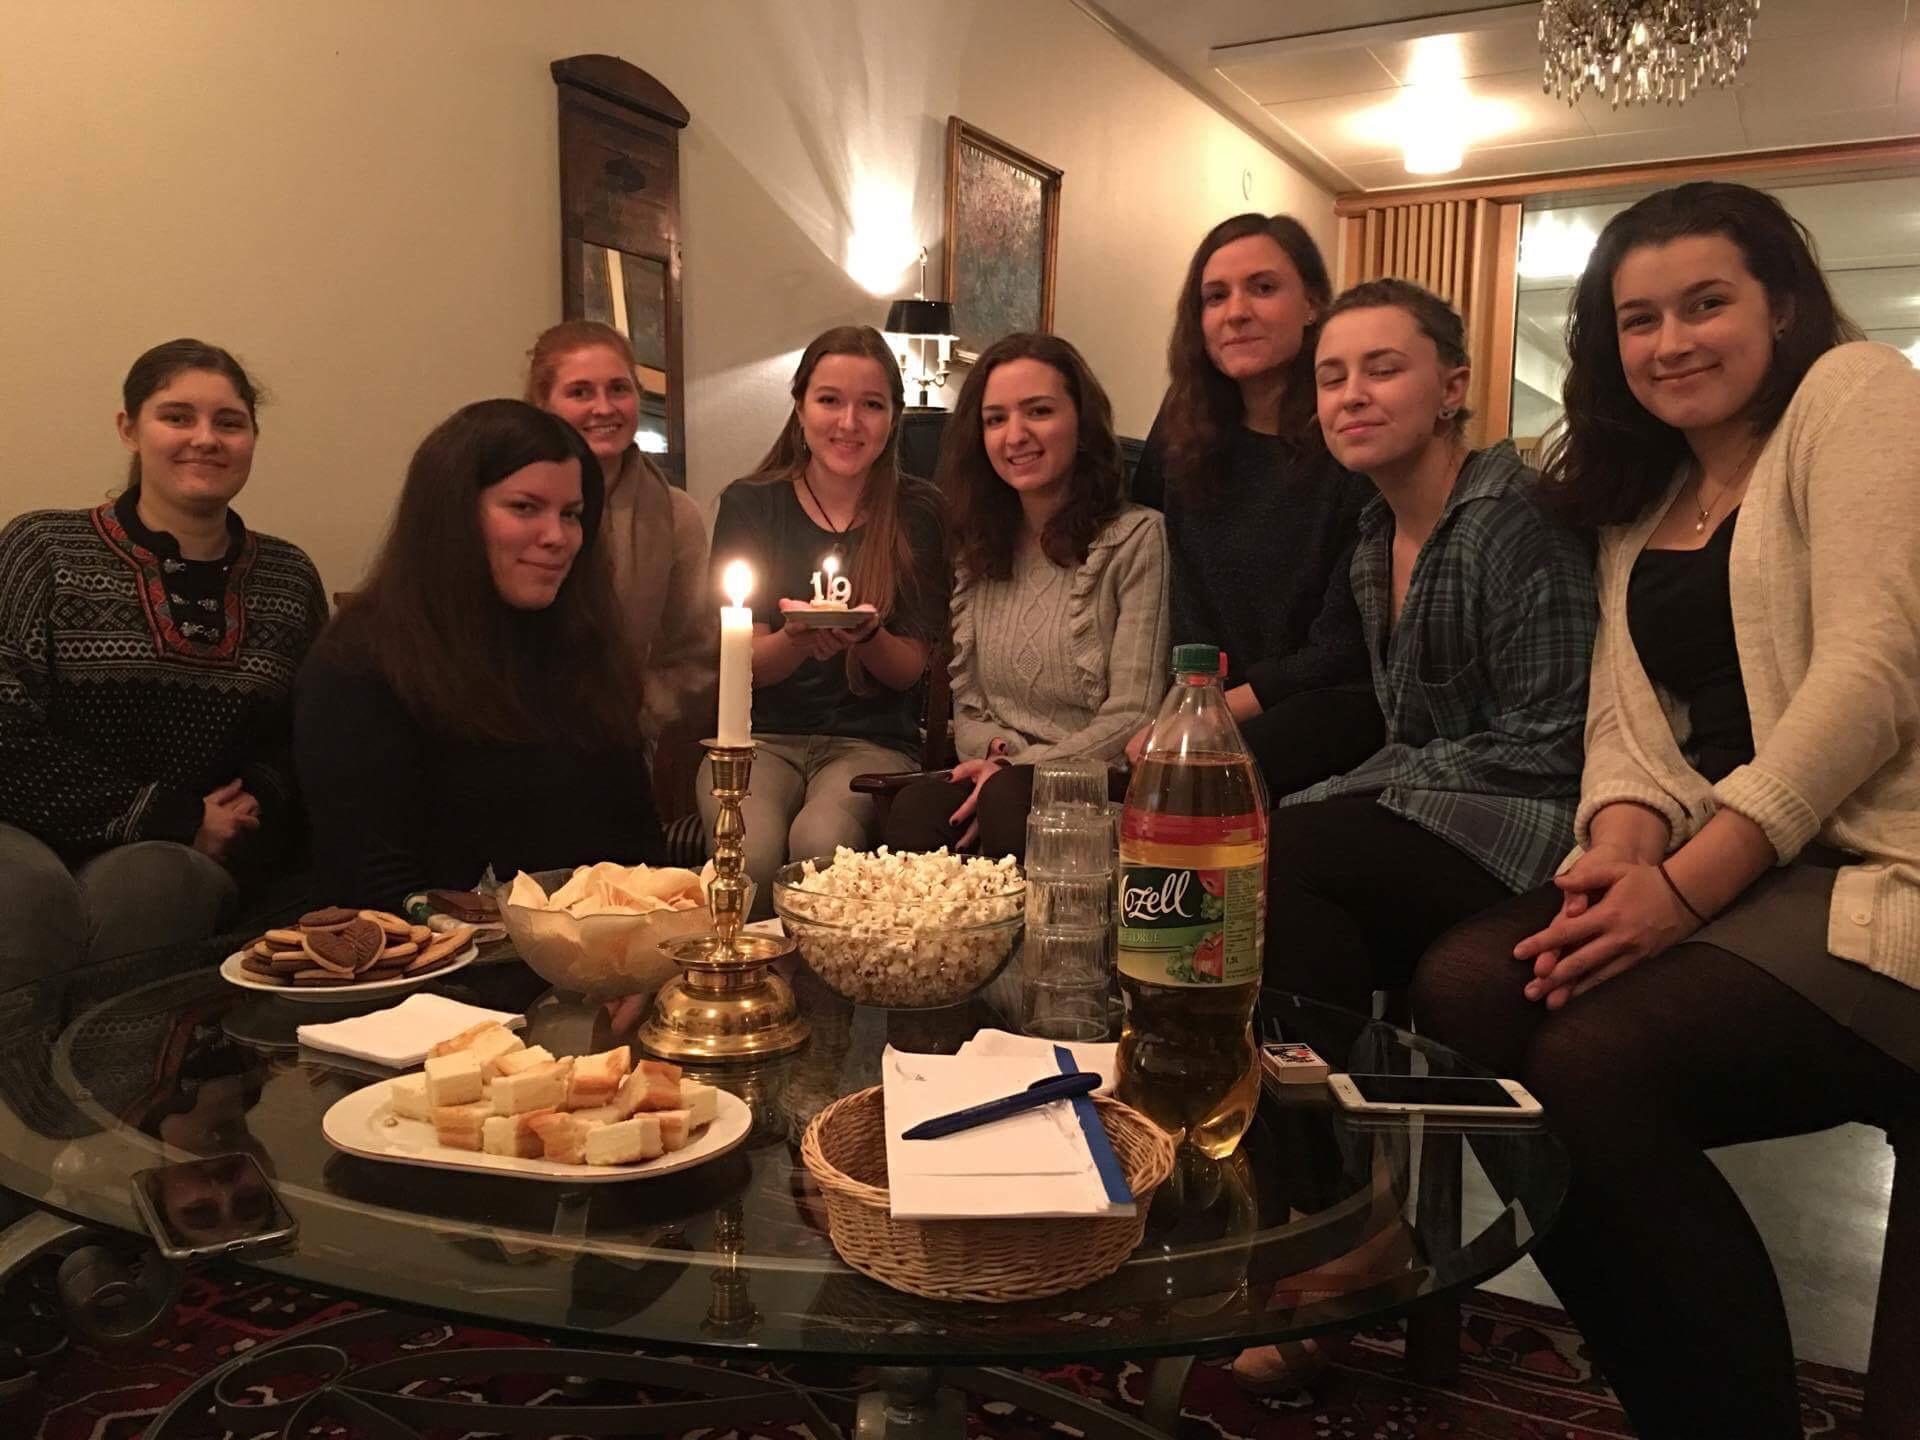 Geburtstagsfeier mit Studentinnen im Katarinahjemmet